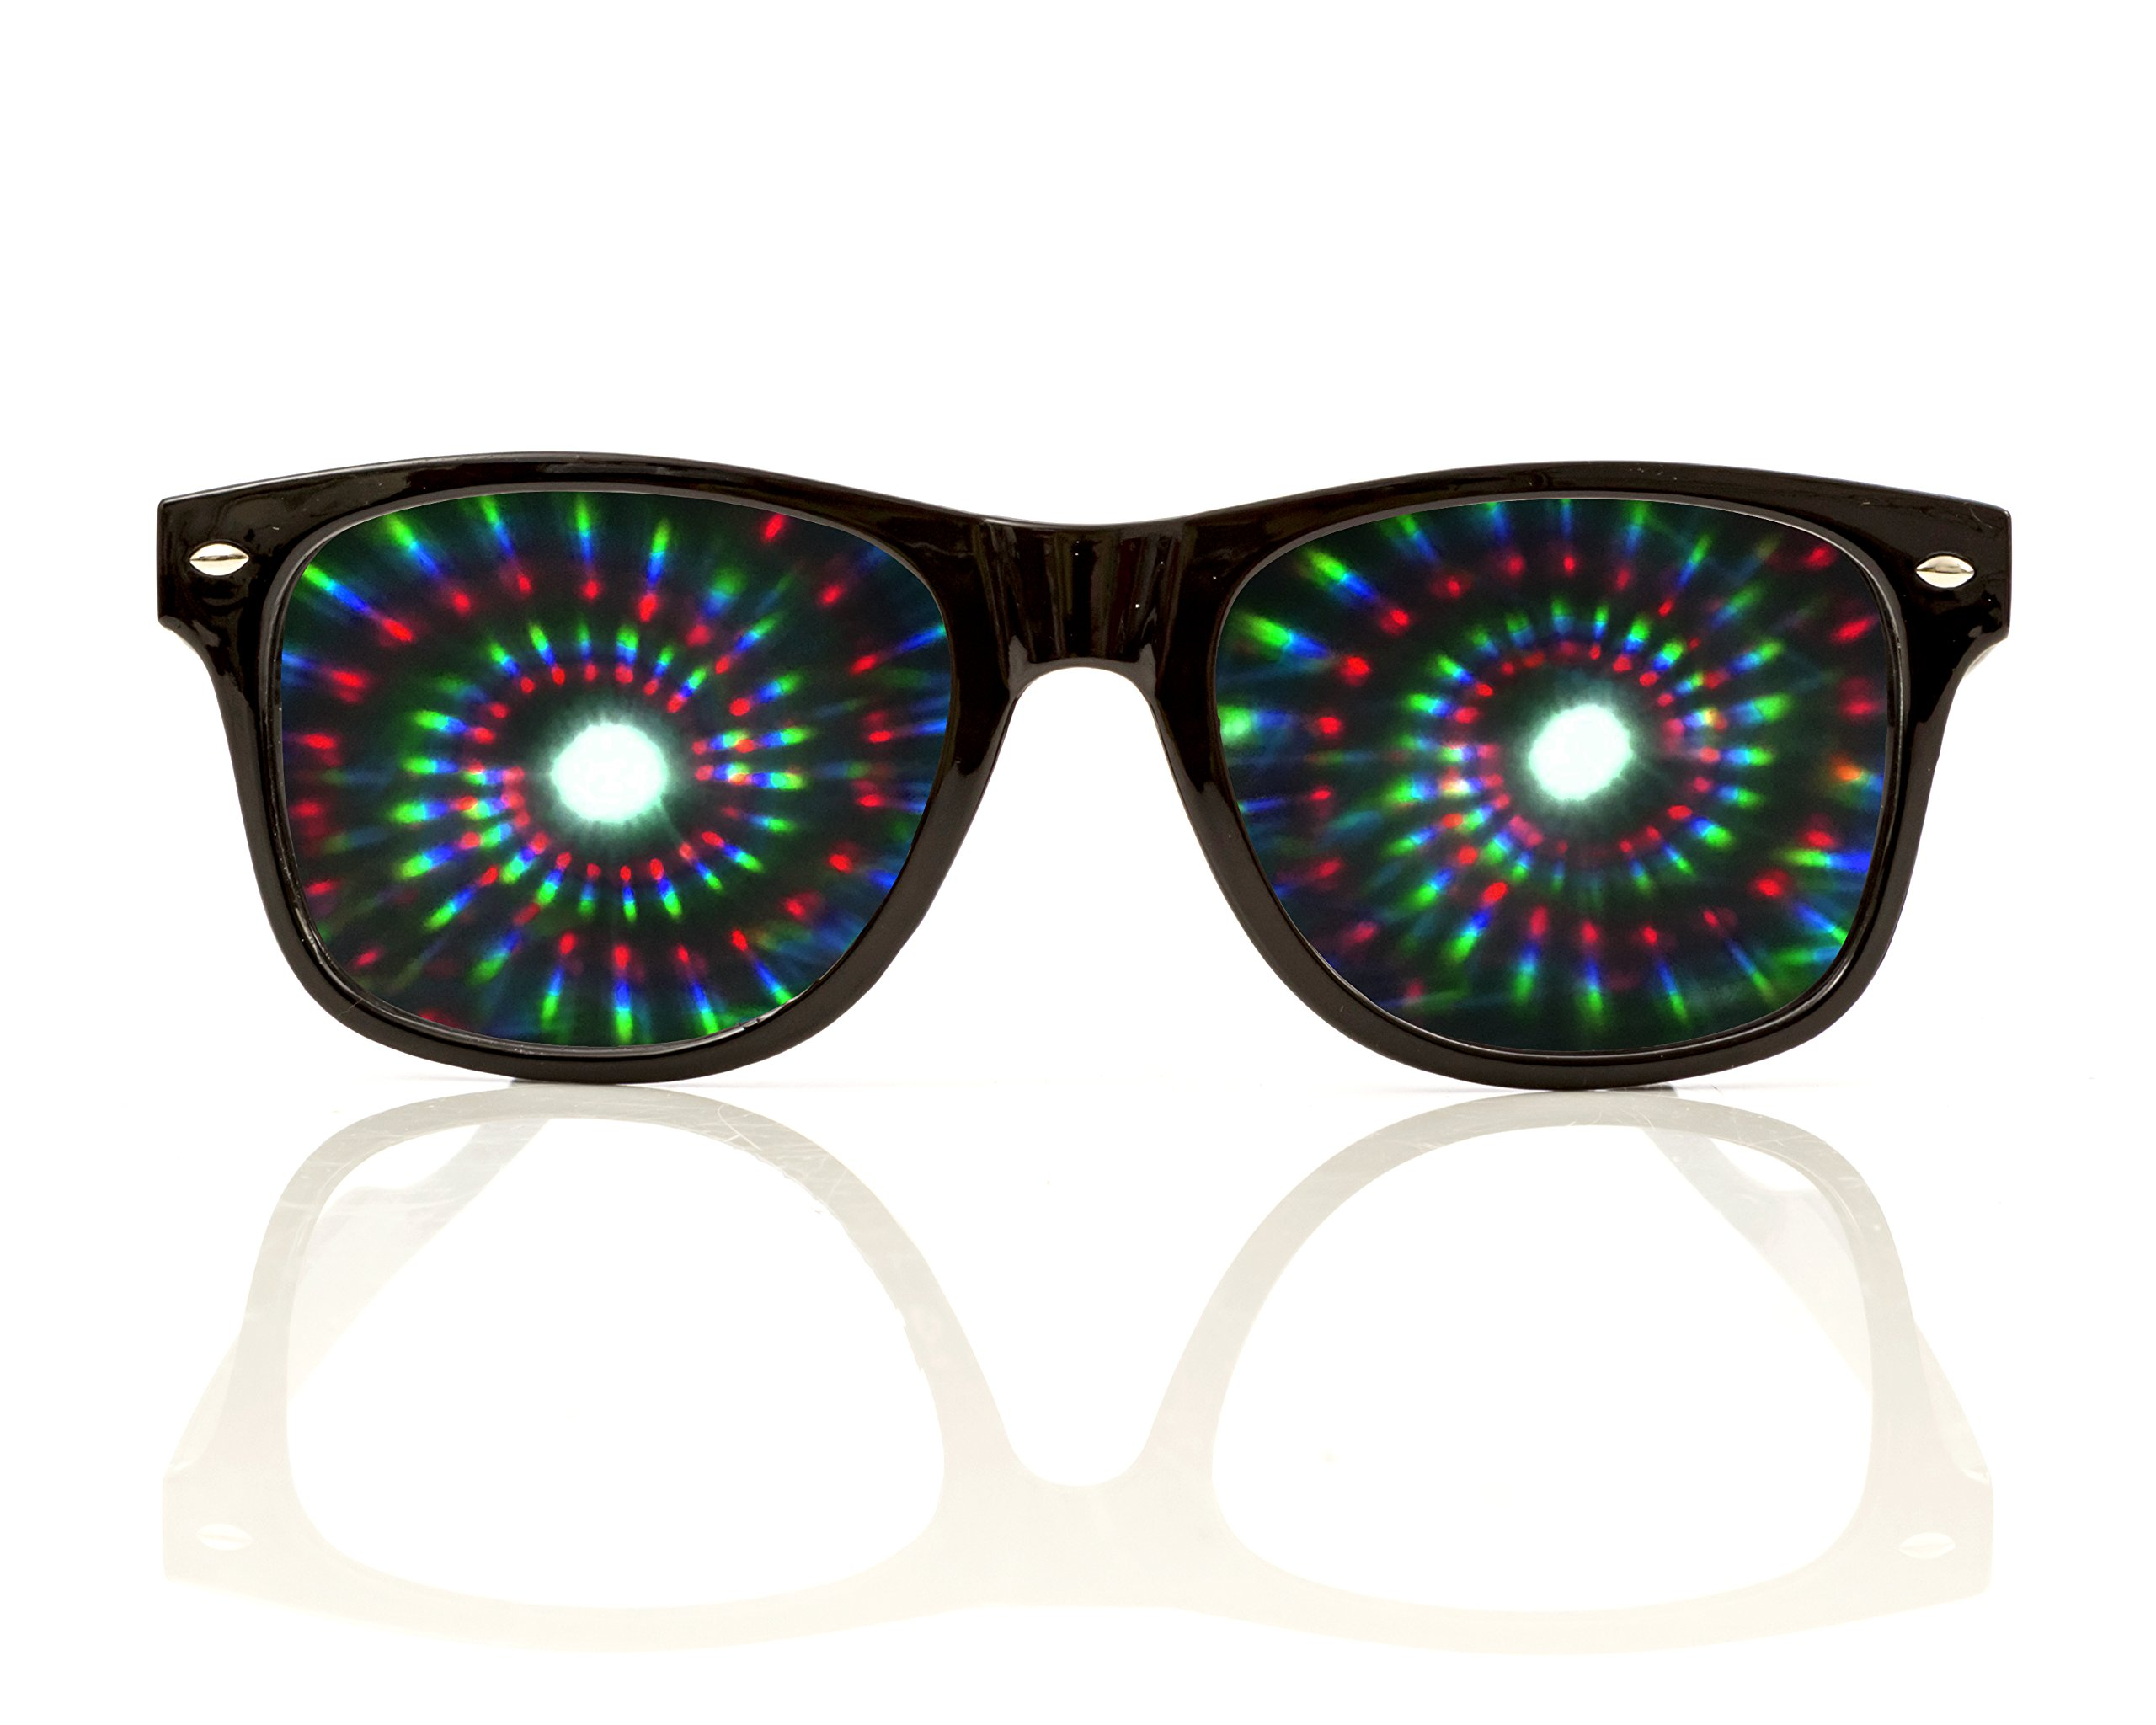 Black Spiral Diffraction Glasses - for Raves, Festivals and More